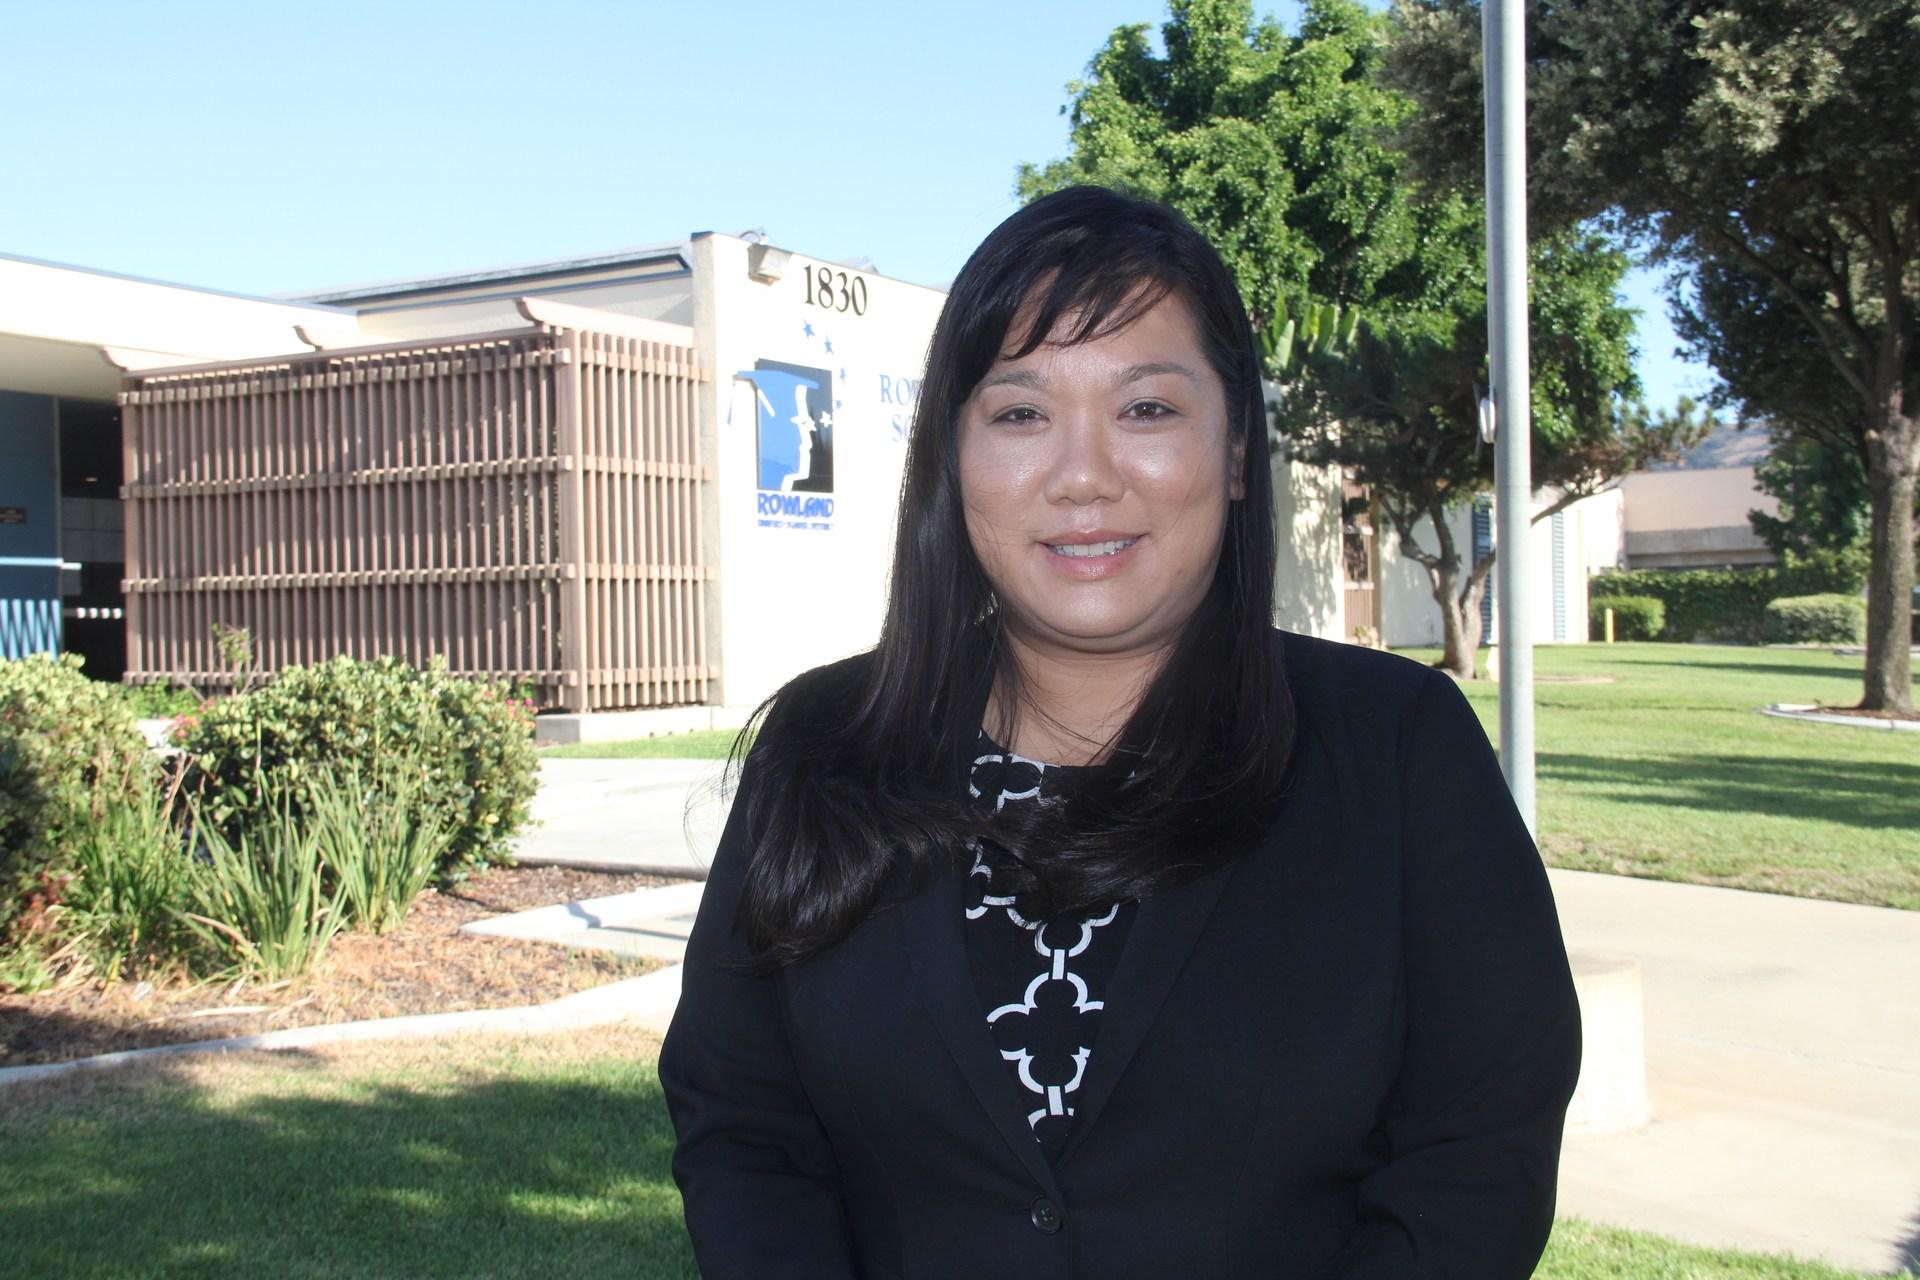 Yorbita Principal Amy Grigsby